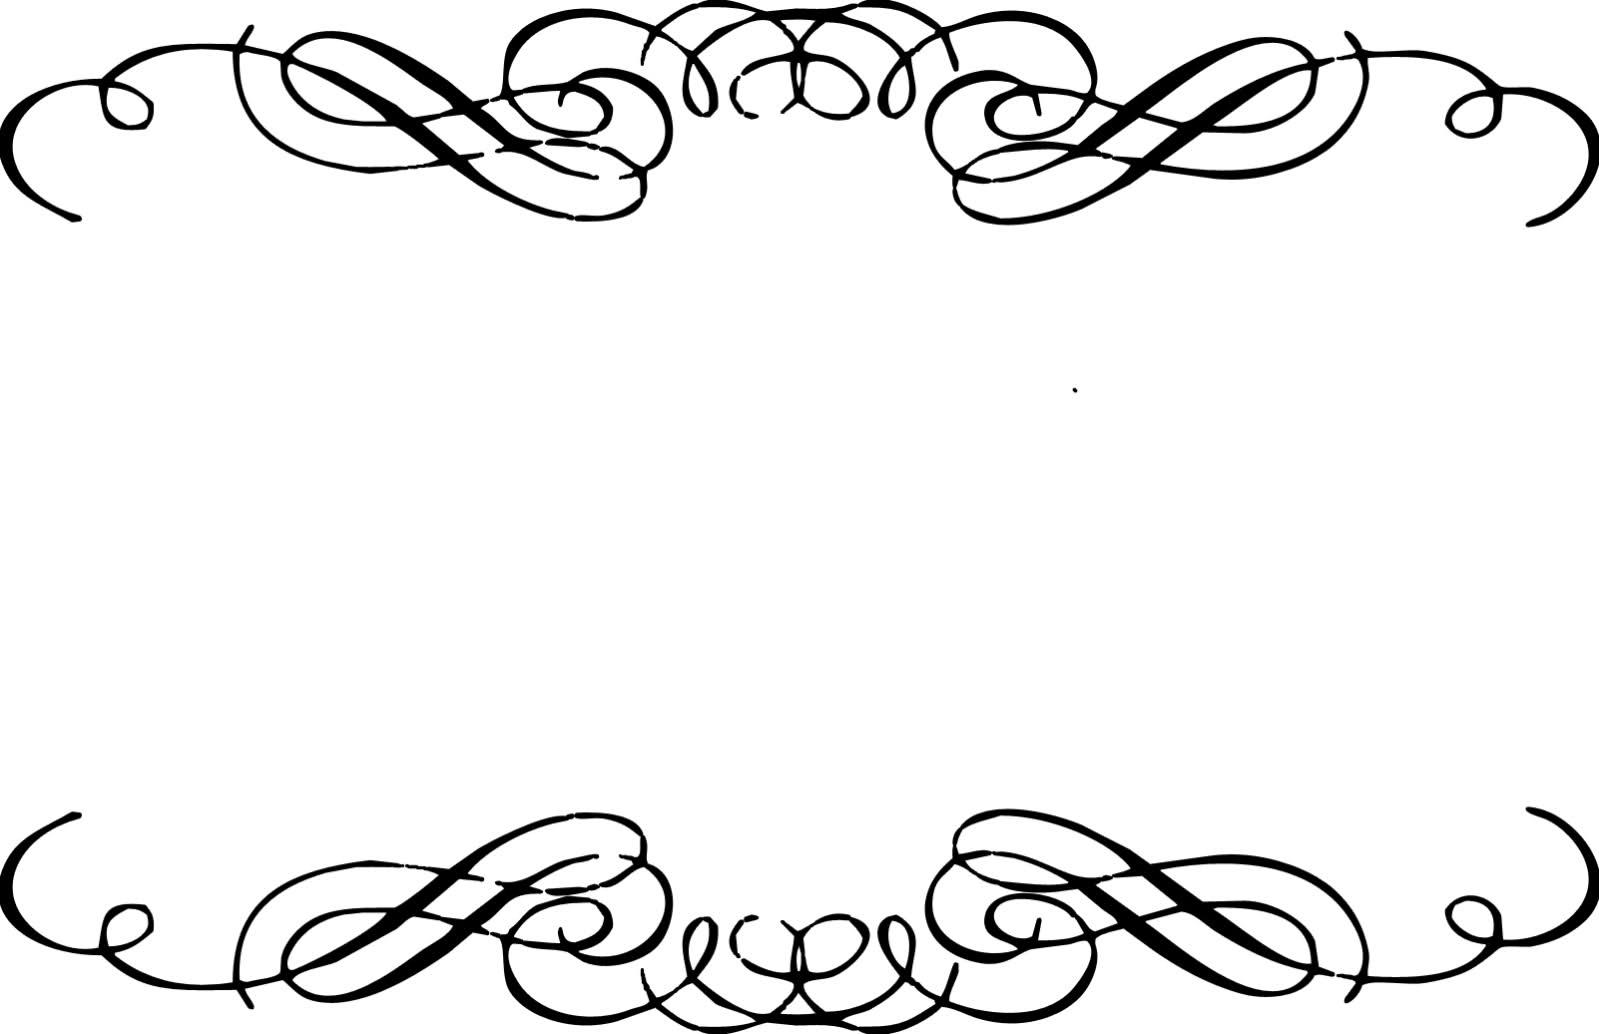 Swirl Border Clipart-swirl border clipart-10